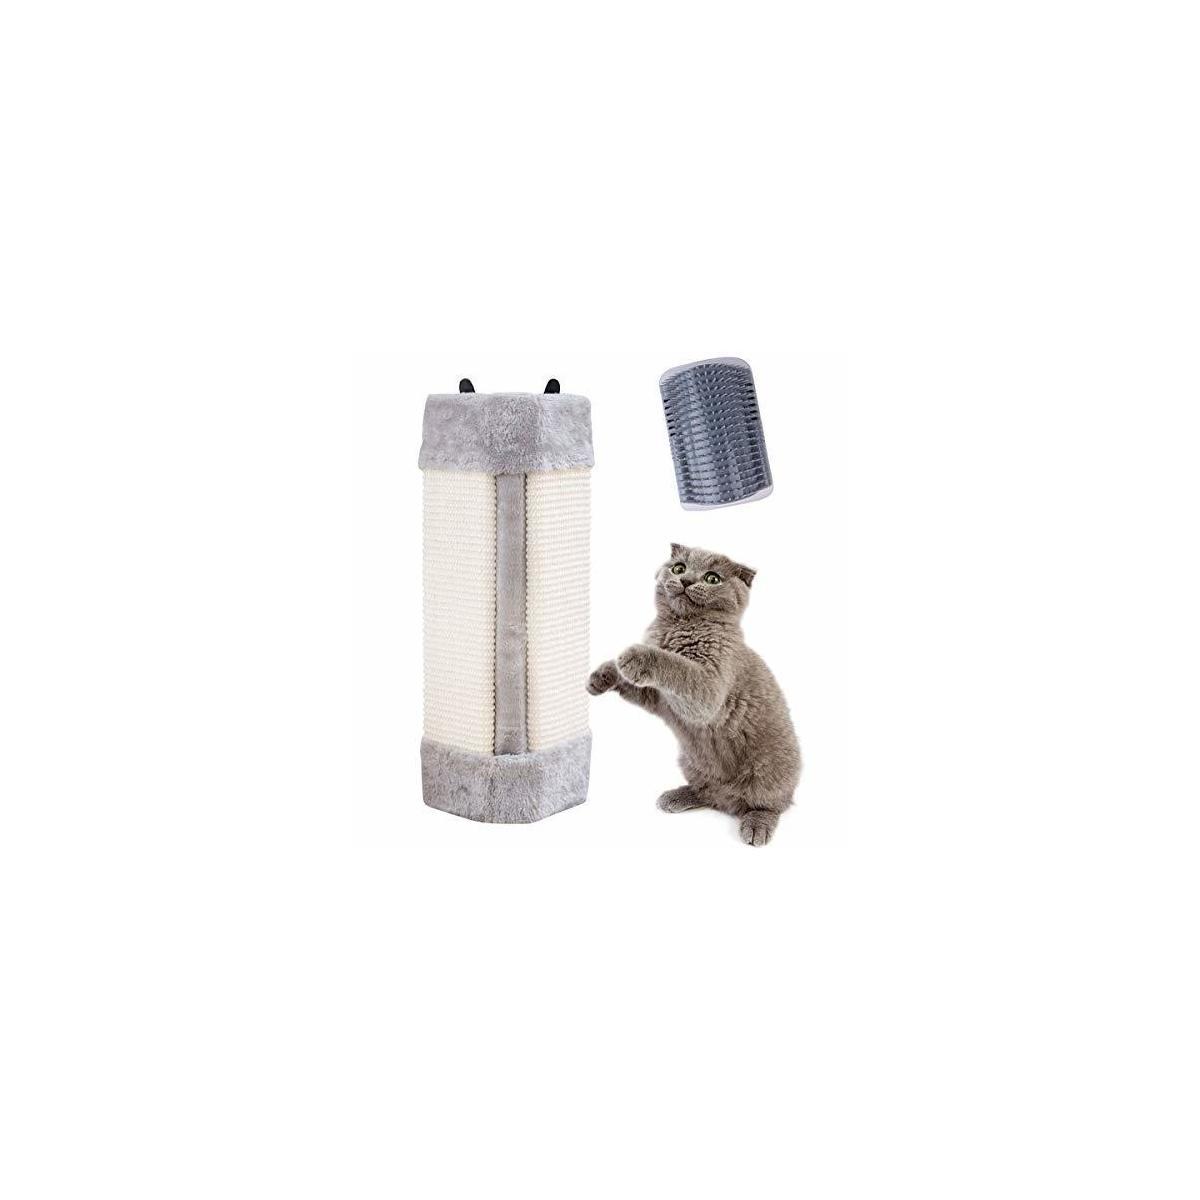 Pampurr Cat Scratcher Cat Scratching Board Pad Hanging Scratcher Cat Wall Mounted Scratching Post//Wall Corner Foldable Pet Sisal Scratcher//Furniture Protector